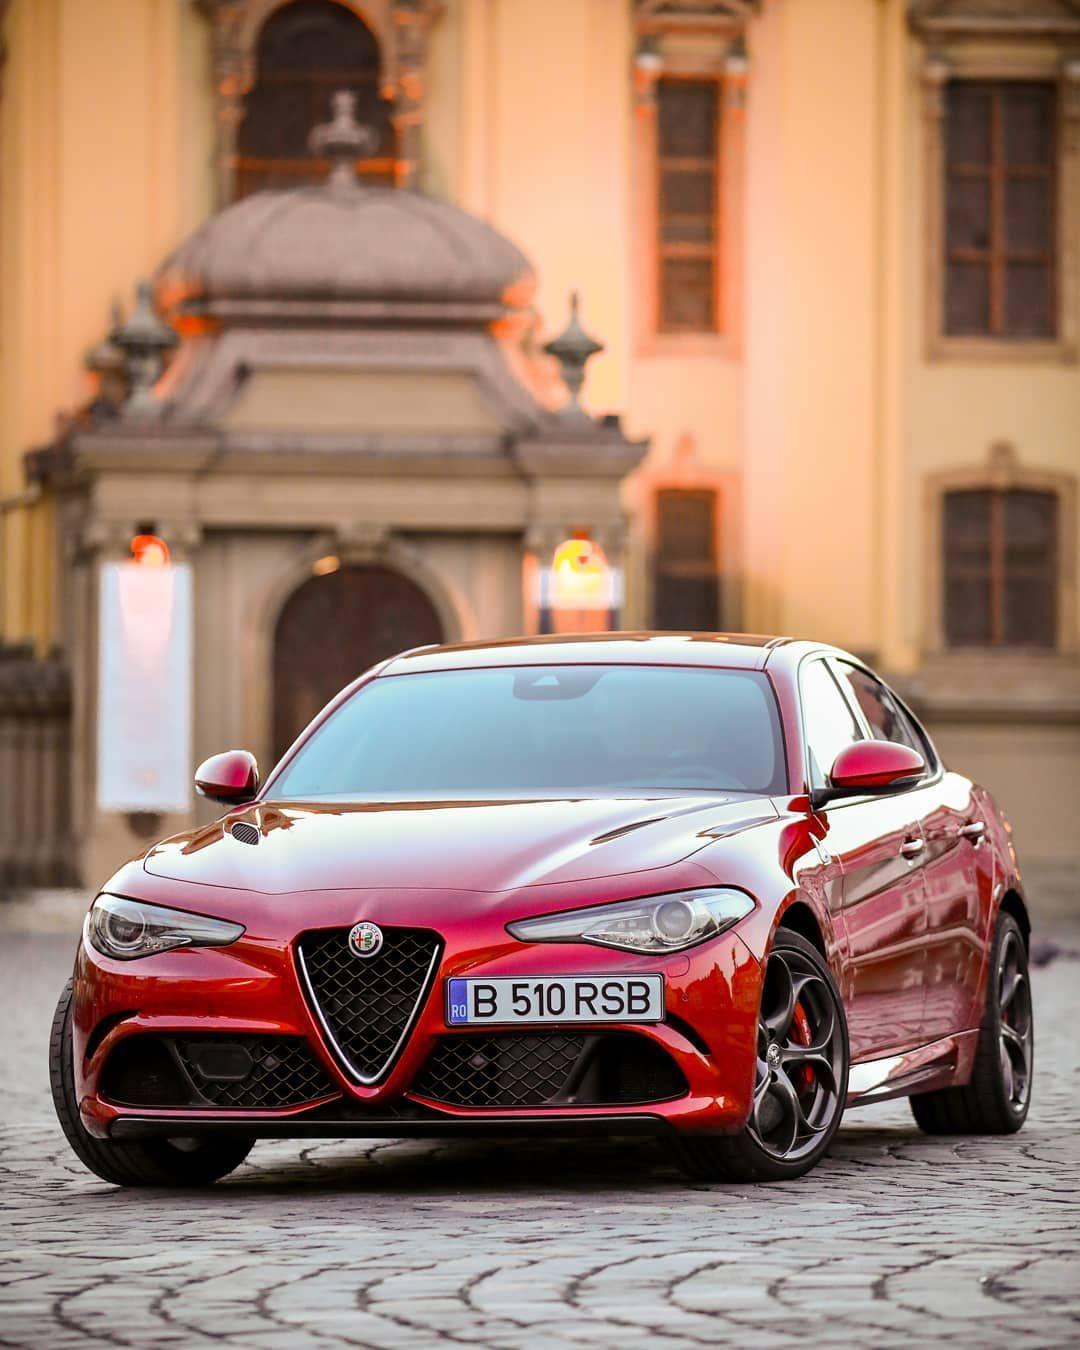 Alfattitude On Instagram Congratulations To Alfaromeouk For Winning The Performance Car Of Performance Cars Alfa Romeo Giulia Quadrifoglio Alfa Romeo Cars